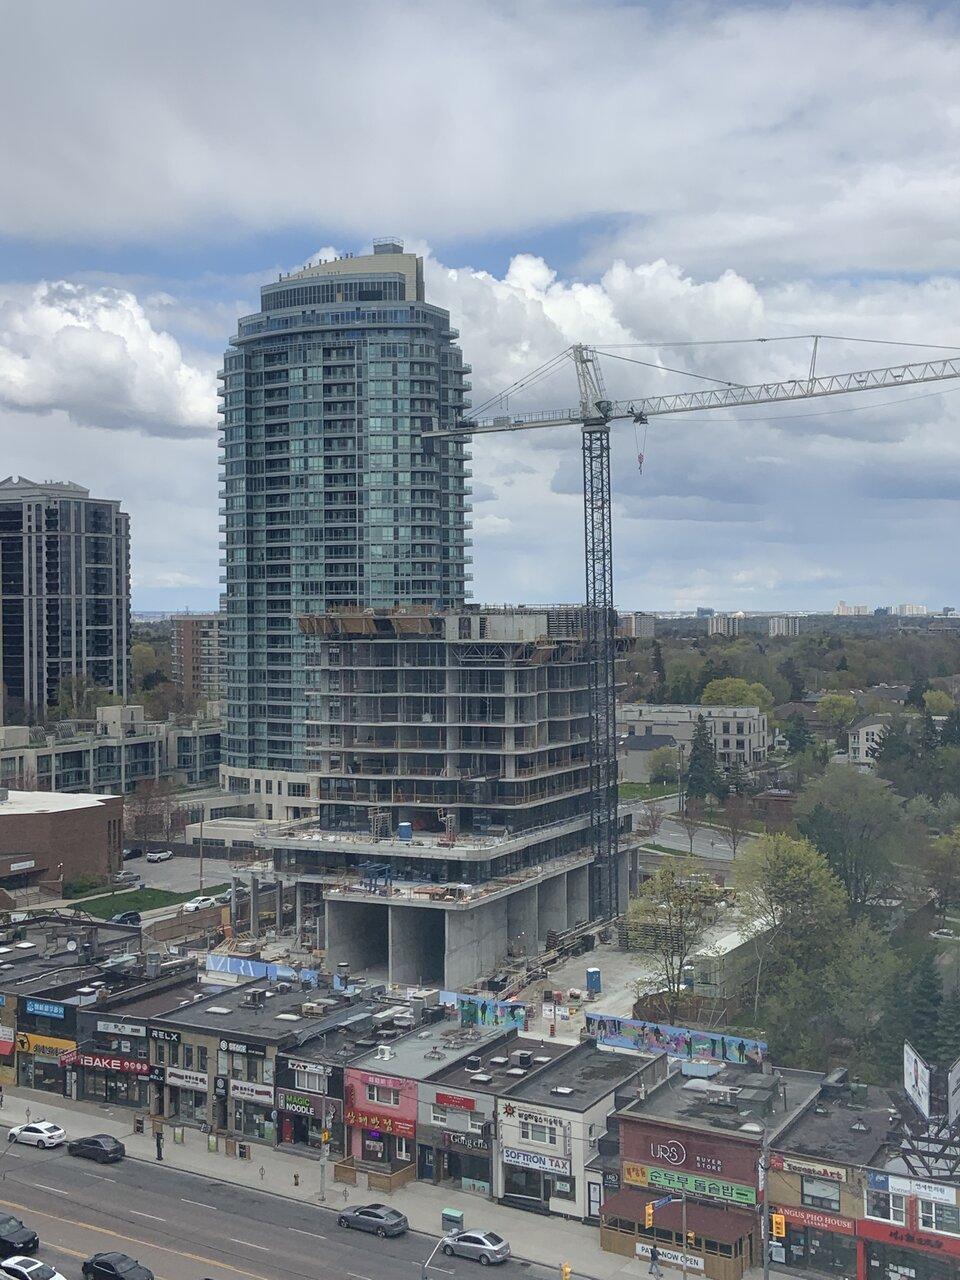 Azura Condos, Capital Developments, IBI Group, Toronto